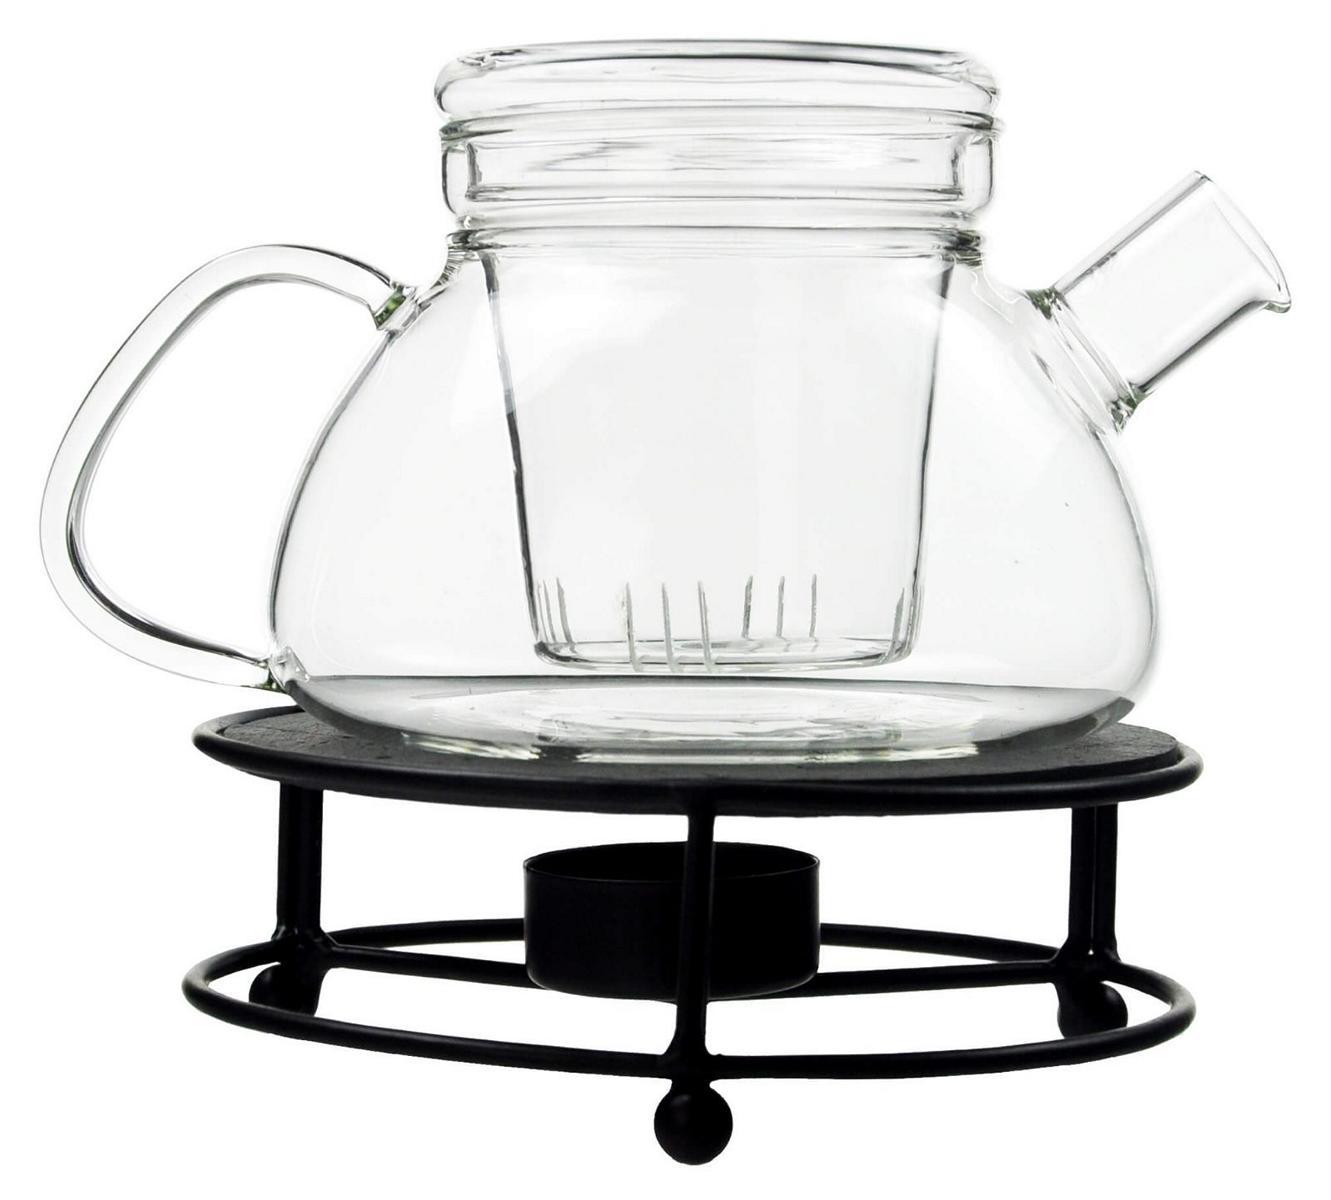 teekanne mit teesieb und metall st vchen glaskanne teekocher teepot teebereiter ebay. Black Bedroom Furniture Sets. Home Design Ideas